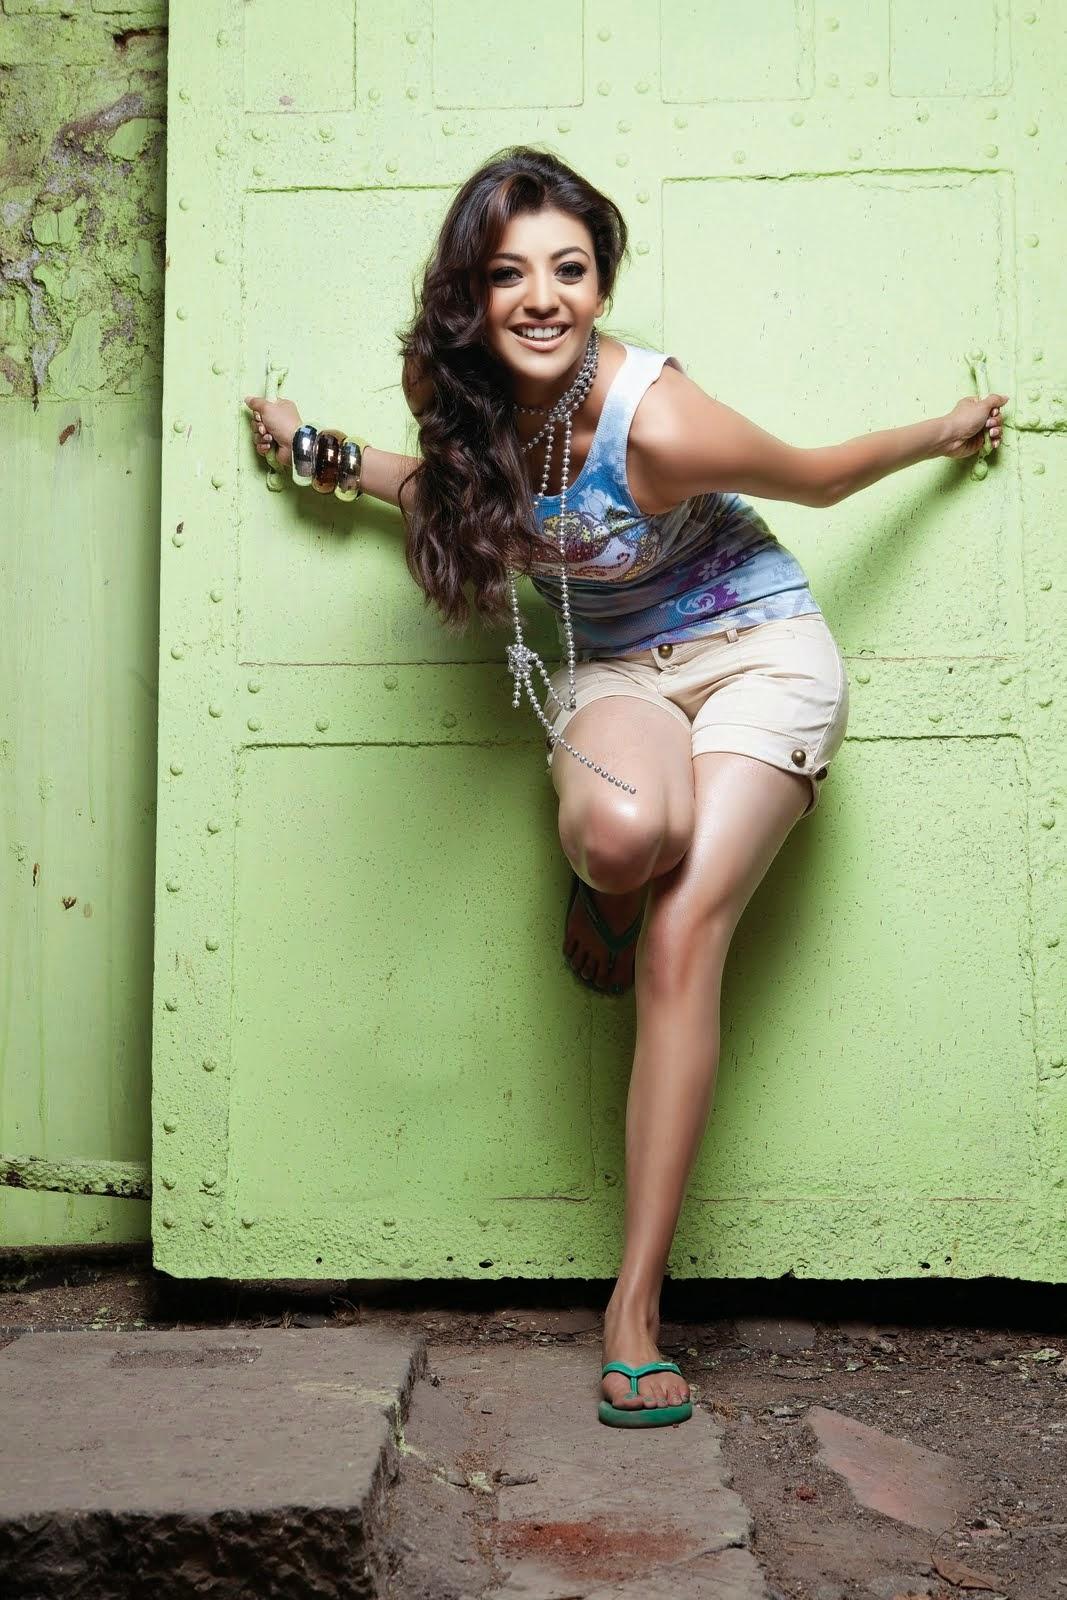 South Indian Actress Kajal Aggarwal Hot Photos and Wallpapers | Hot Images